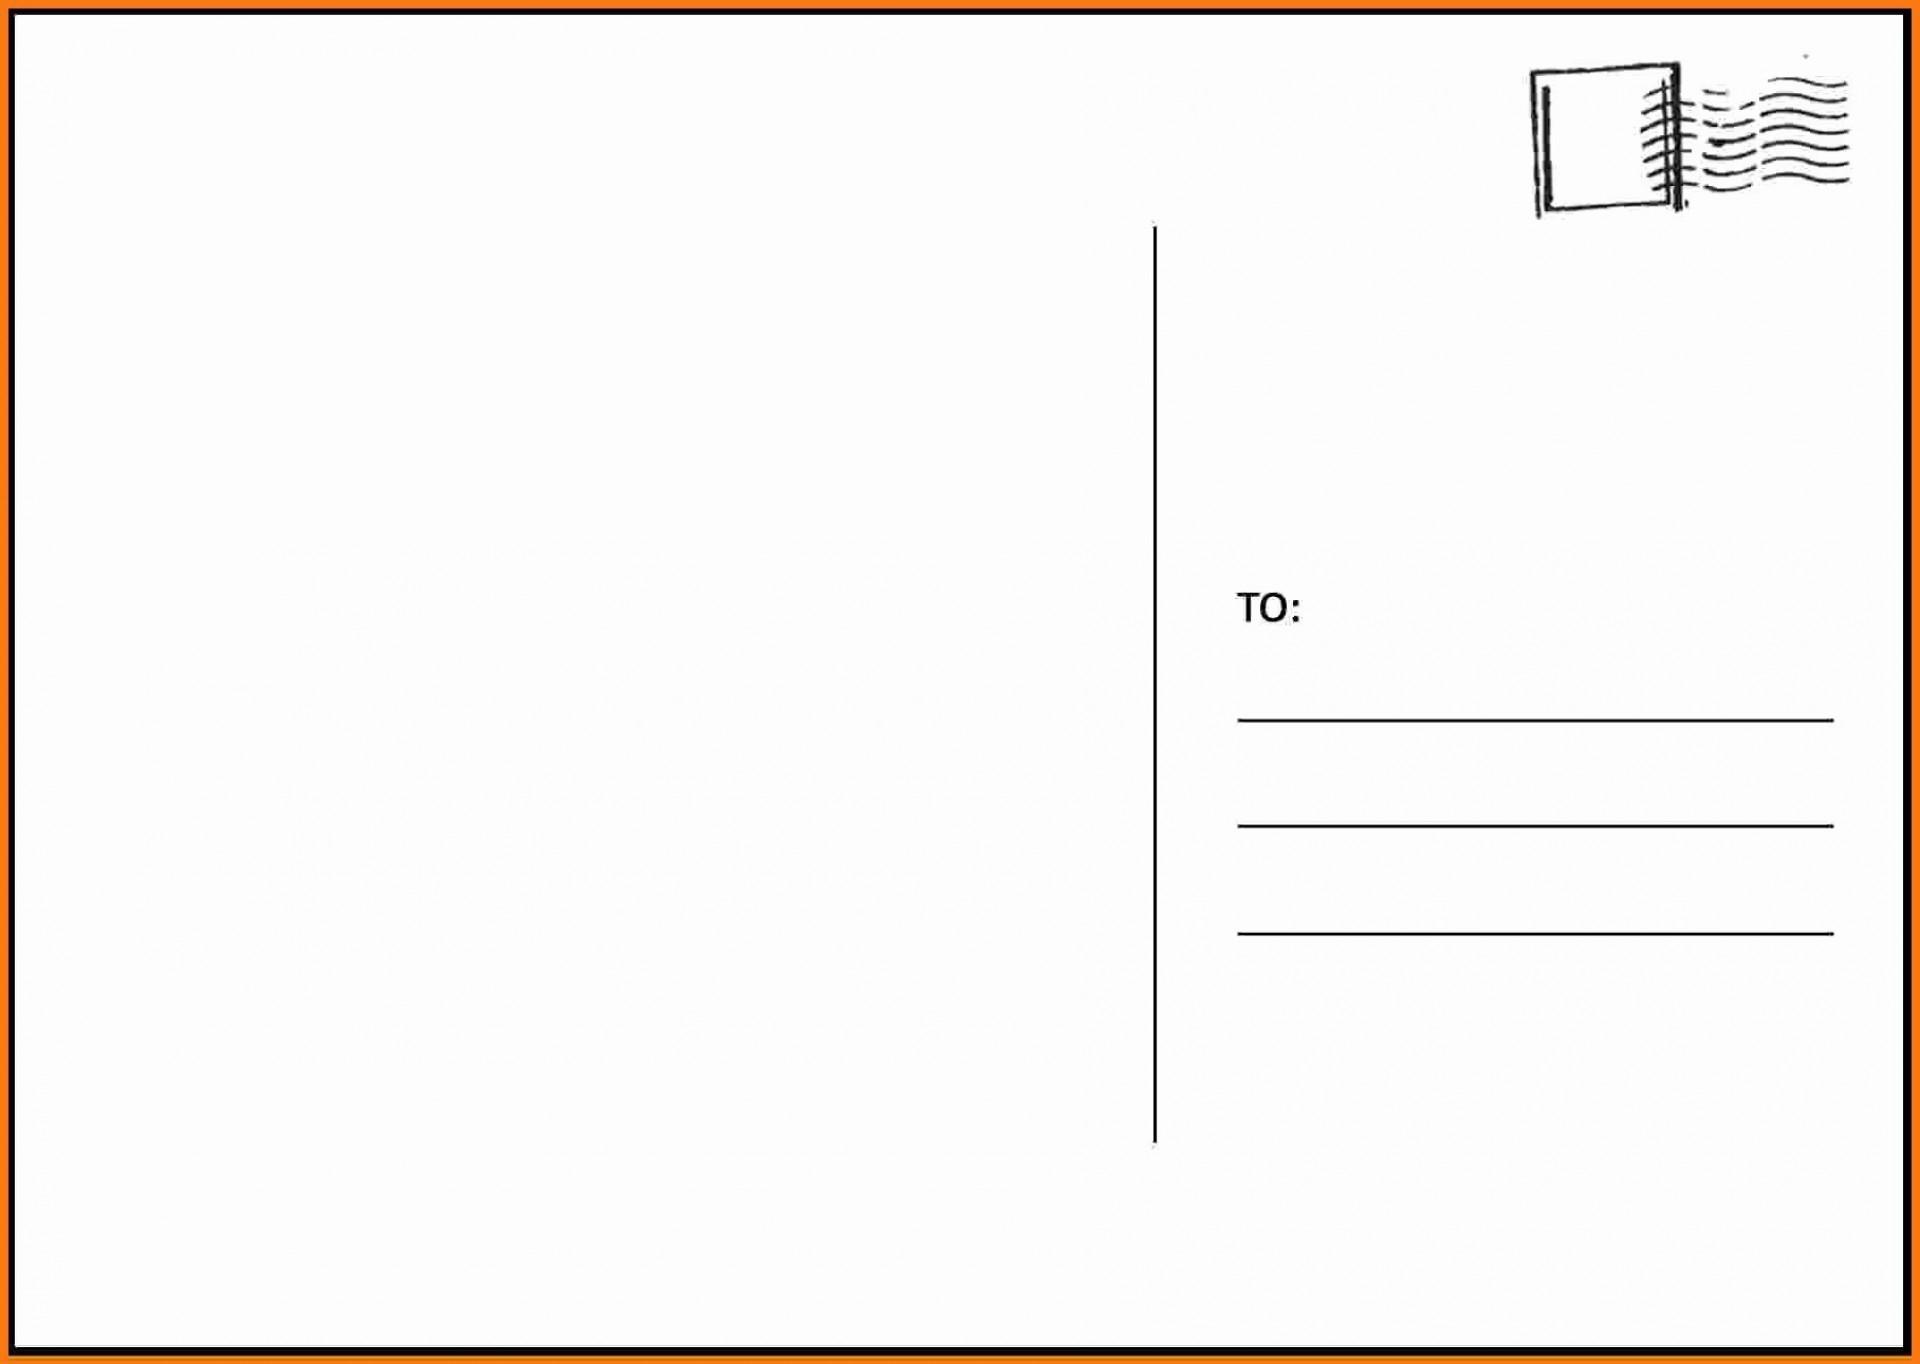 005 Breathtaking 5 X 7 Postcard Template Microsoft Word High Def 1920